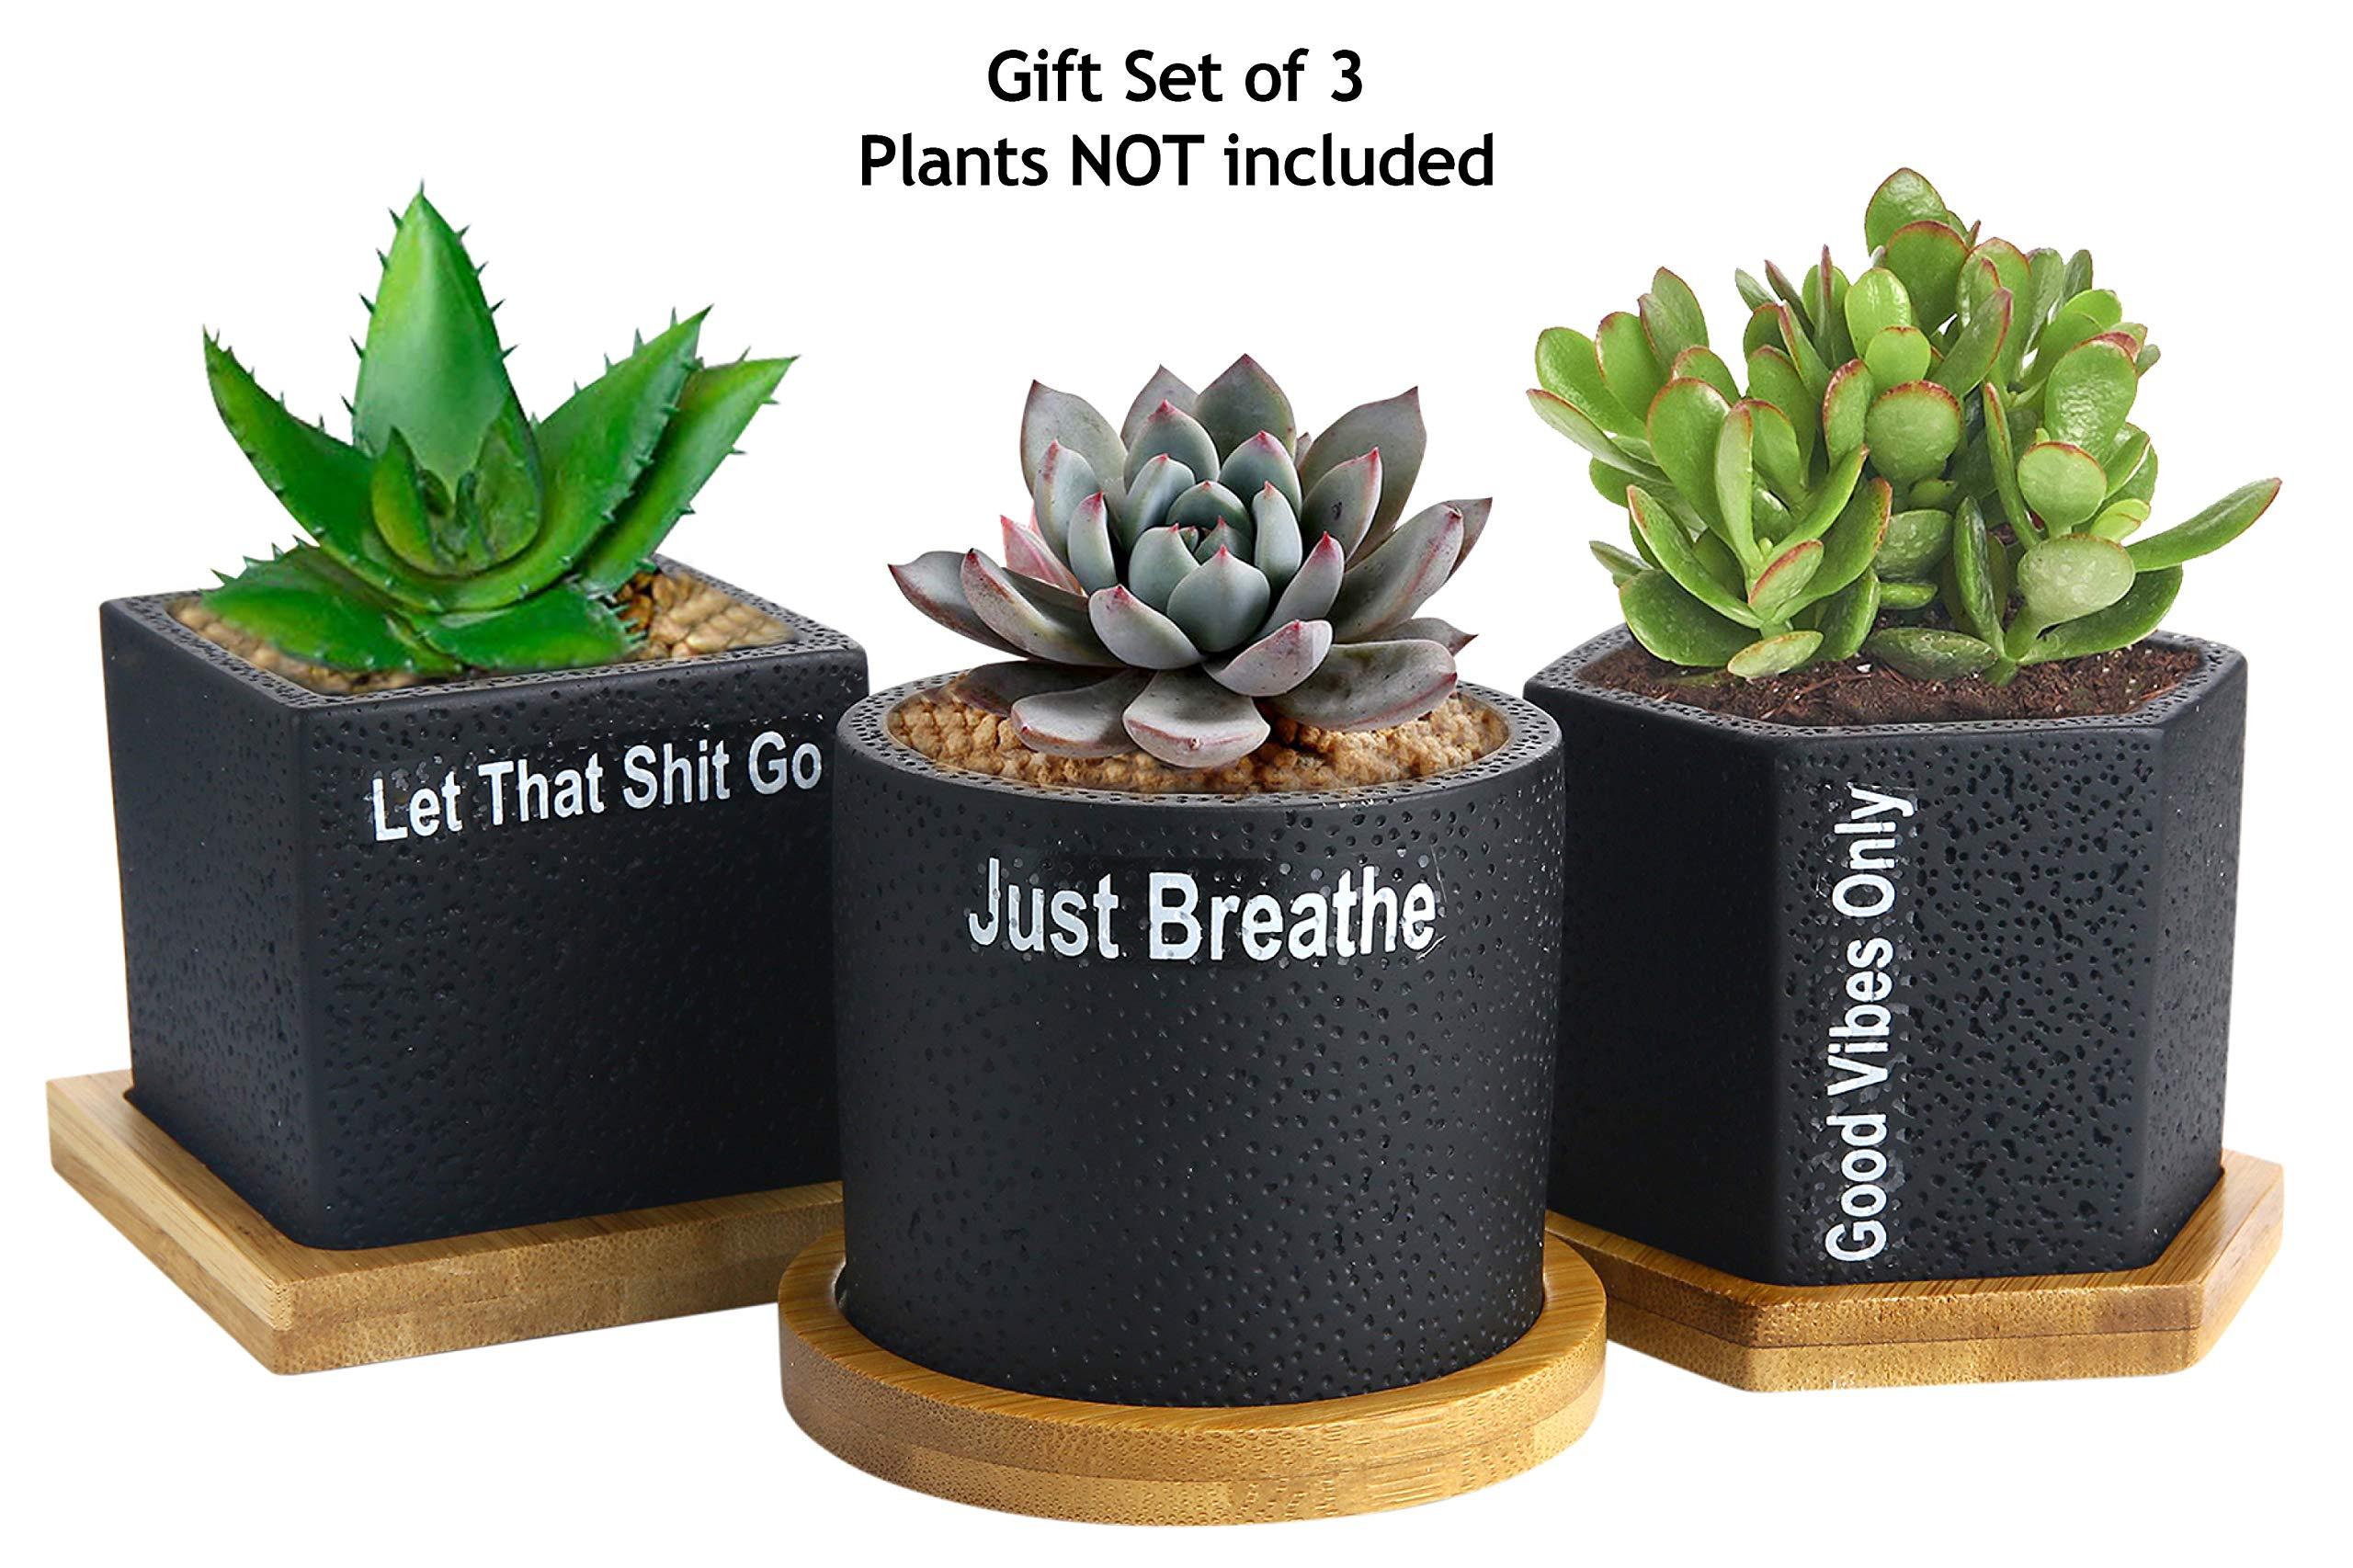 Succulent Pots Planter Cactus Pot - 2.75 inch Succulent Planters Black Concrete for Succulents Herbs Mini Flowers Plants Drainage Bamboo Tray Set of 3 Great Self Care Gift to Be Zen